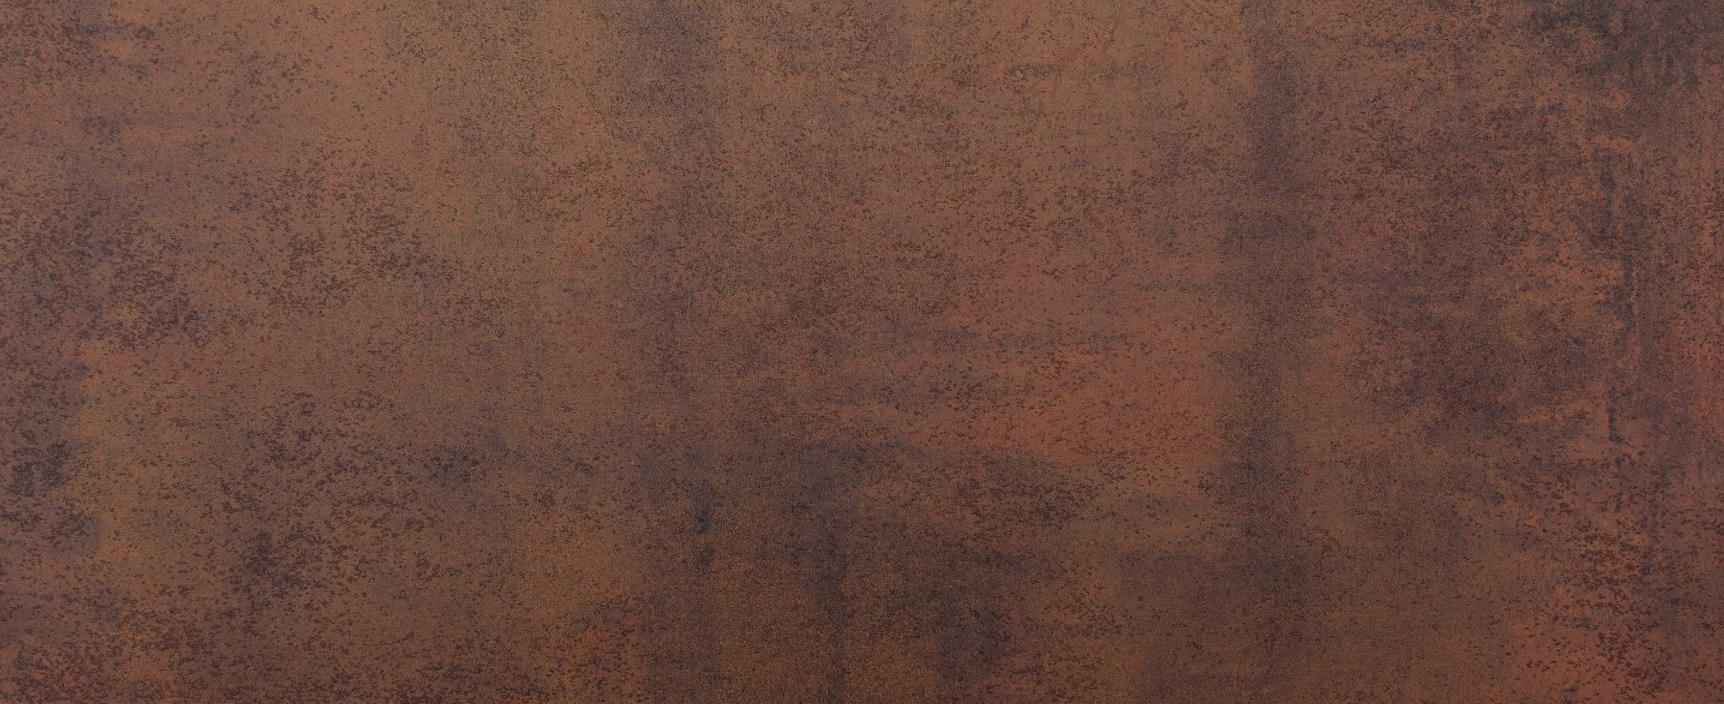 iron corten neolith arbeitsplatten sensationelle iron corten neolith neolith. Black Bedroom Furniture Sets. Home Design Ideas